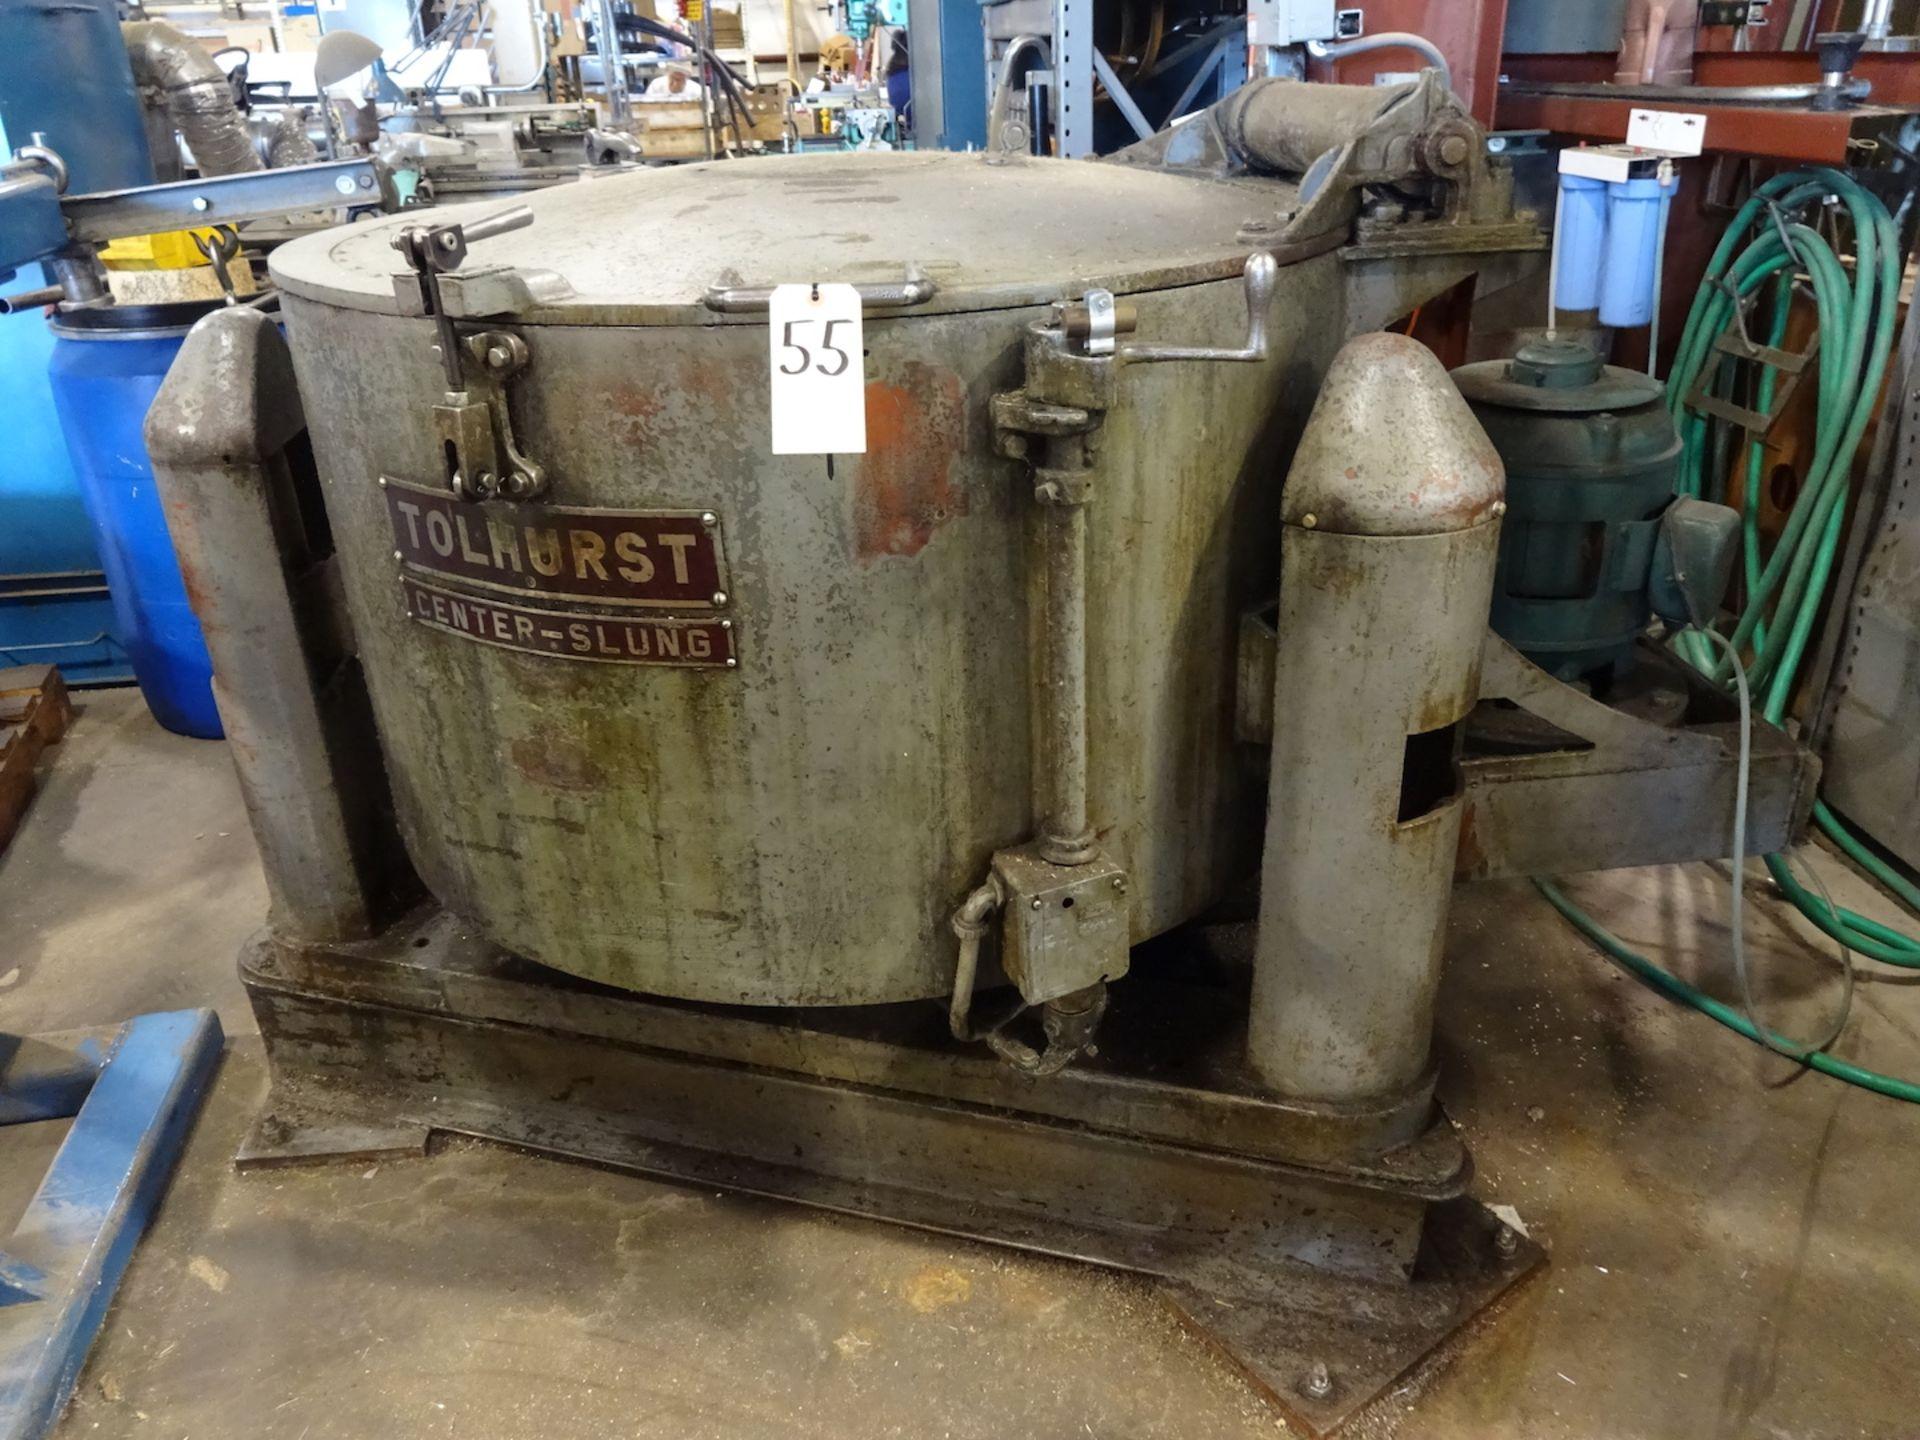 Lot 55 - Tolhurst Center-Slung Size 40 Oil Separator, S/N T88438, 700 RPM